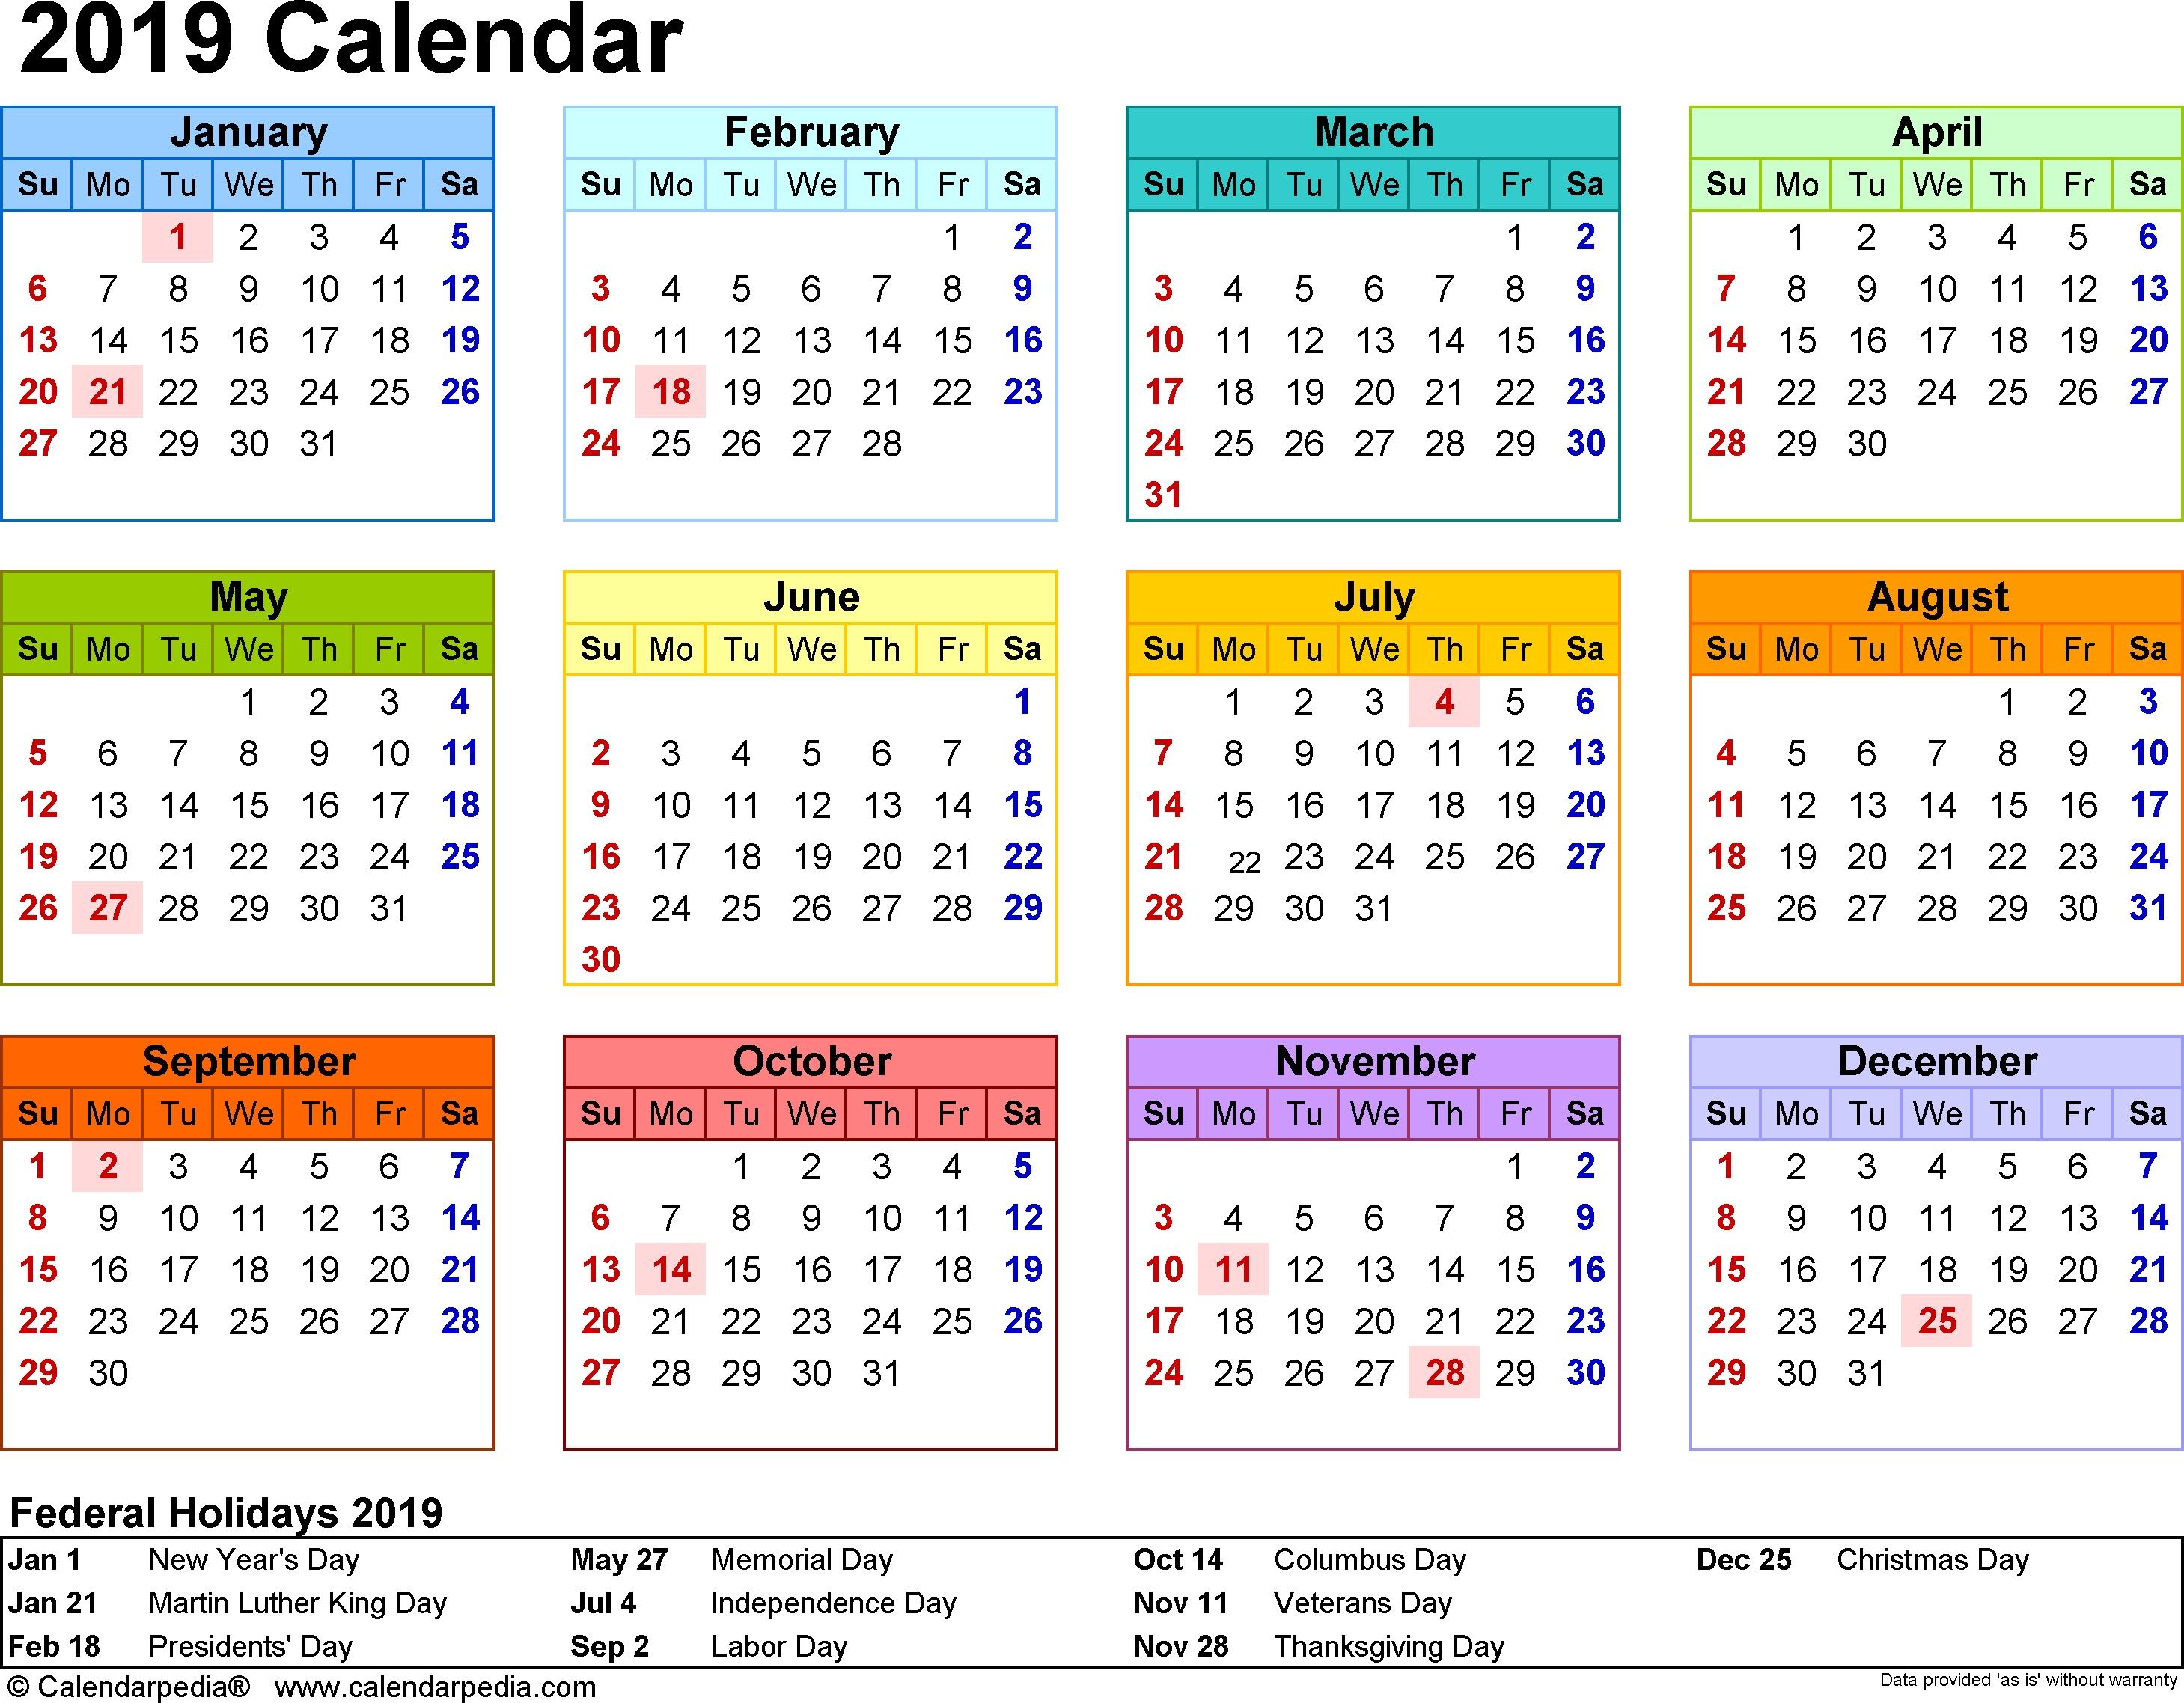 Printable School Calendar 2019 South Africa | Printable Calendar 2019_School Calendar Eastern Cape 2020